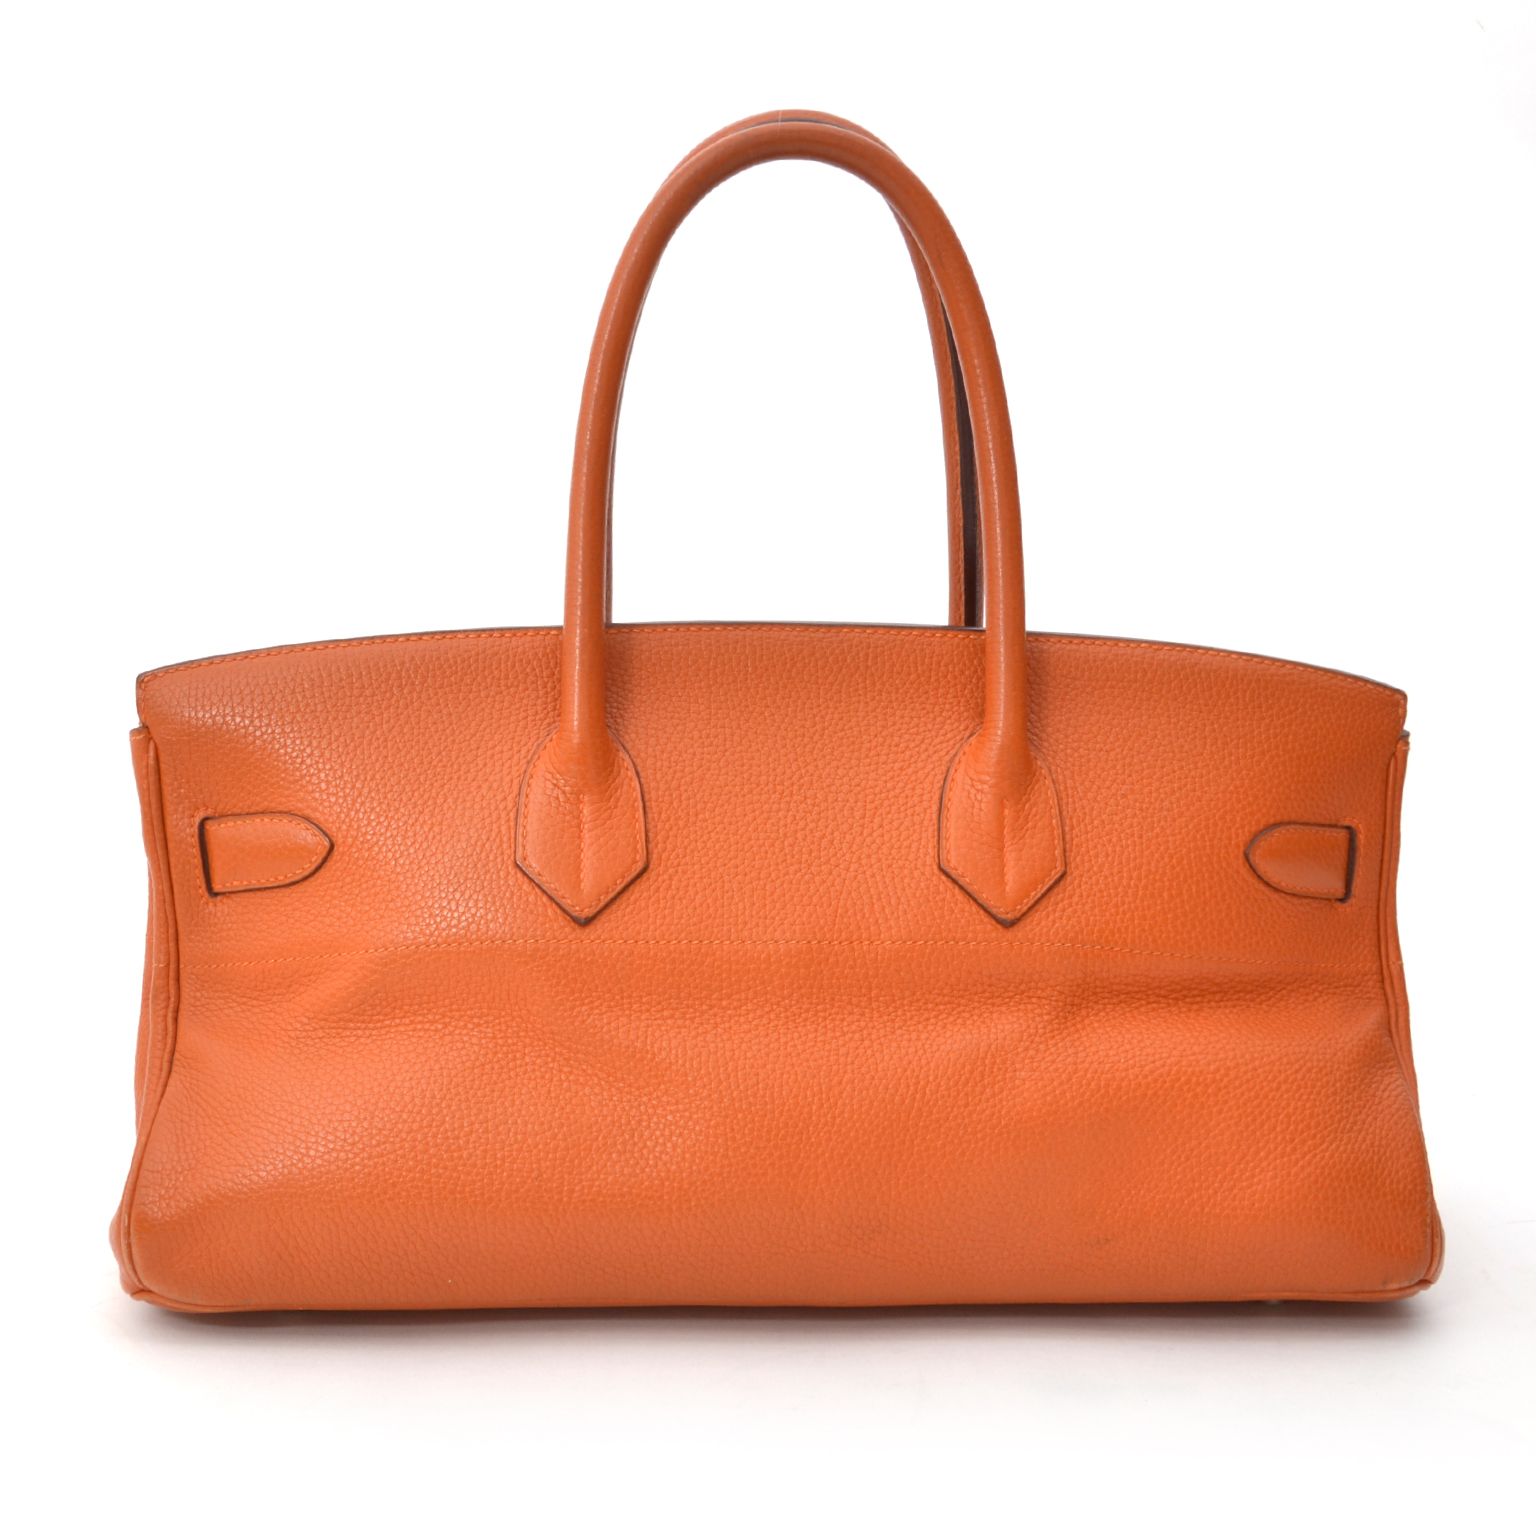 b7533cdaa2a5 Buy and shop safe online at labellov Hermès Birkin Shoulder Bag PHW Pumpkin  Orange european vintage designer reseller labellov offers international  shipping